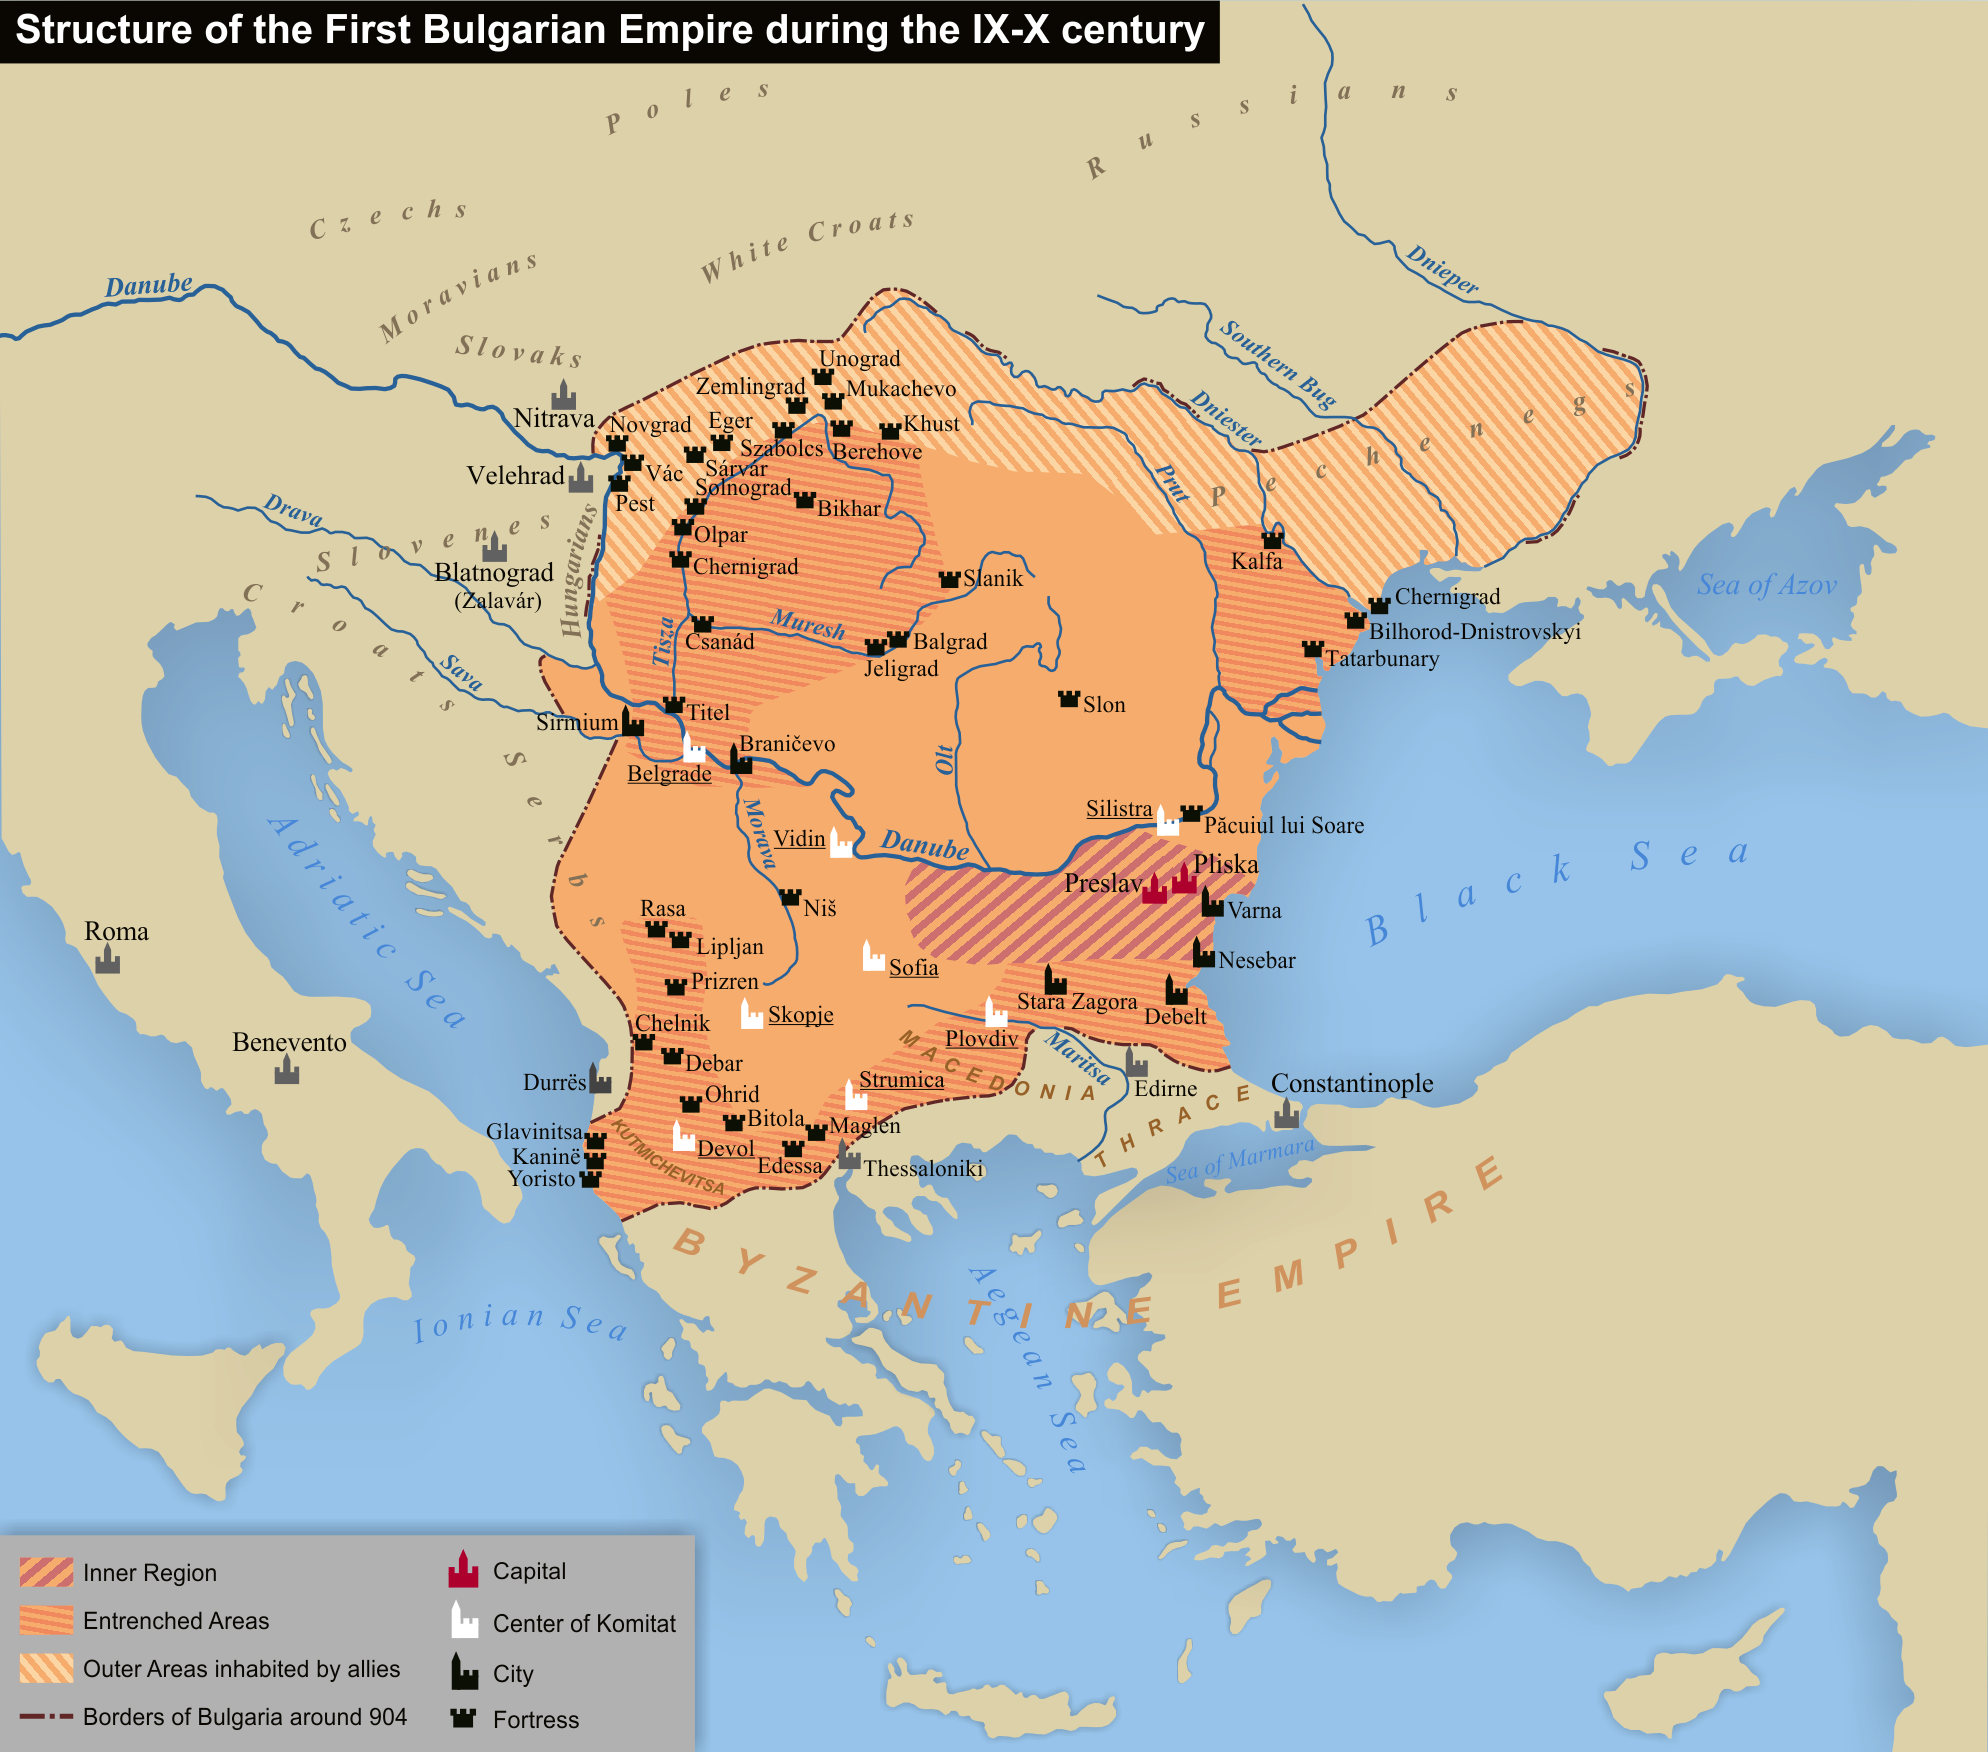 First Bulgarian Empire